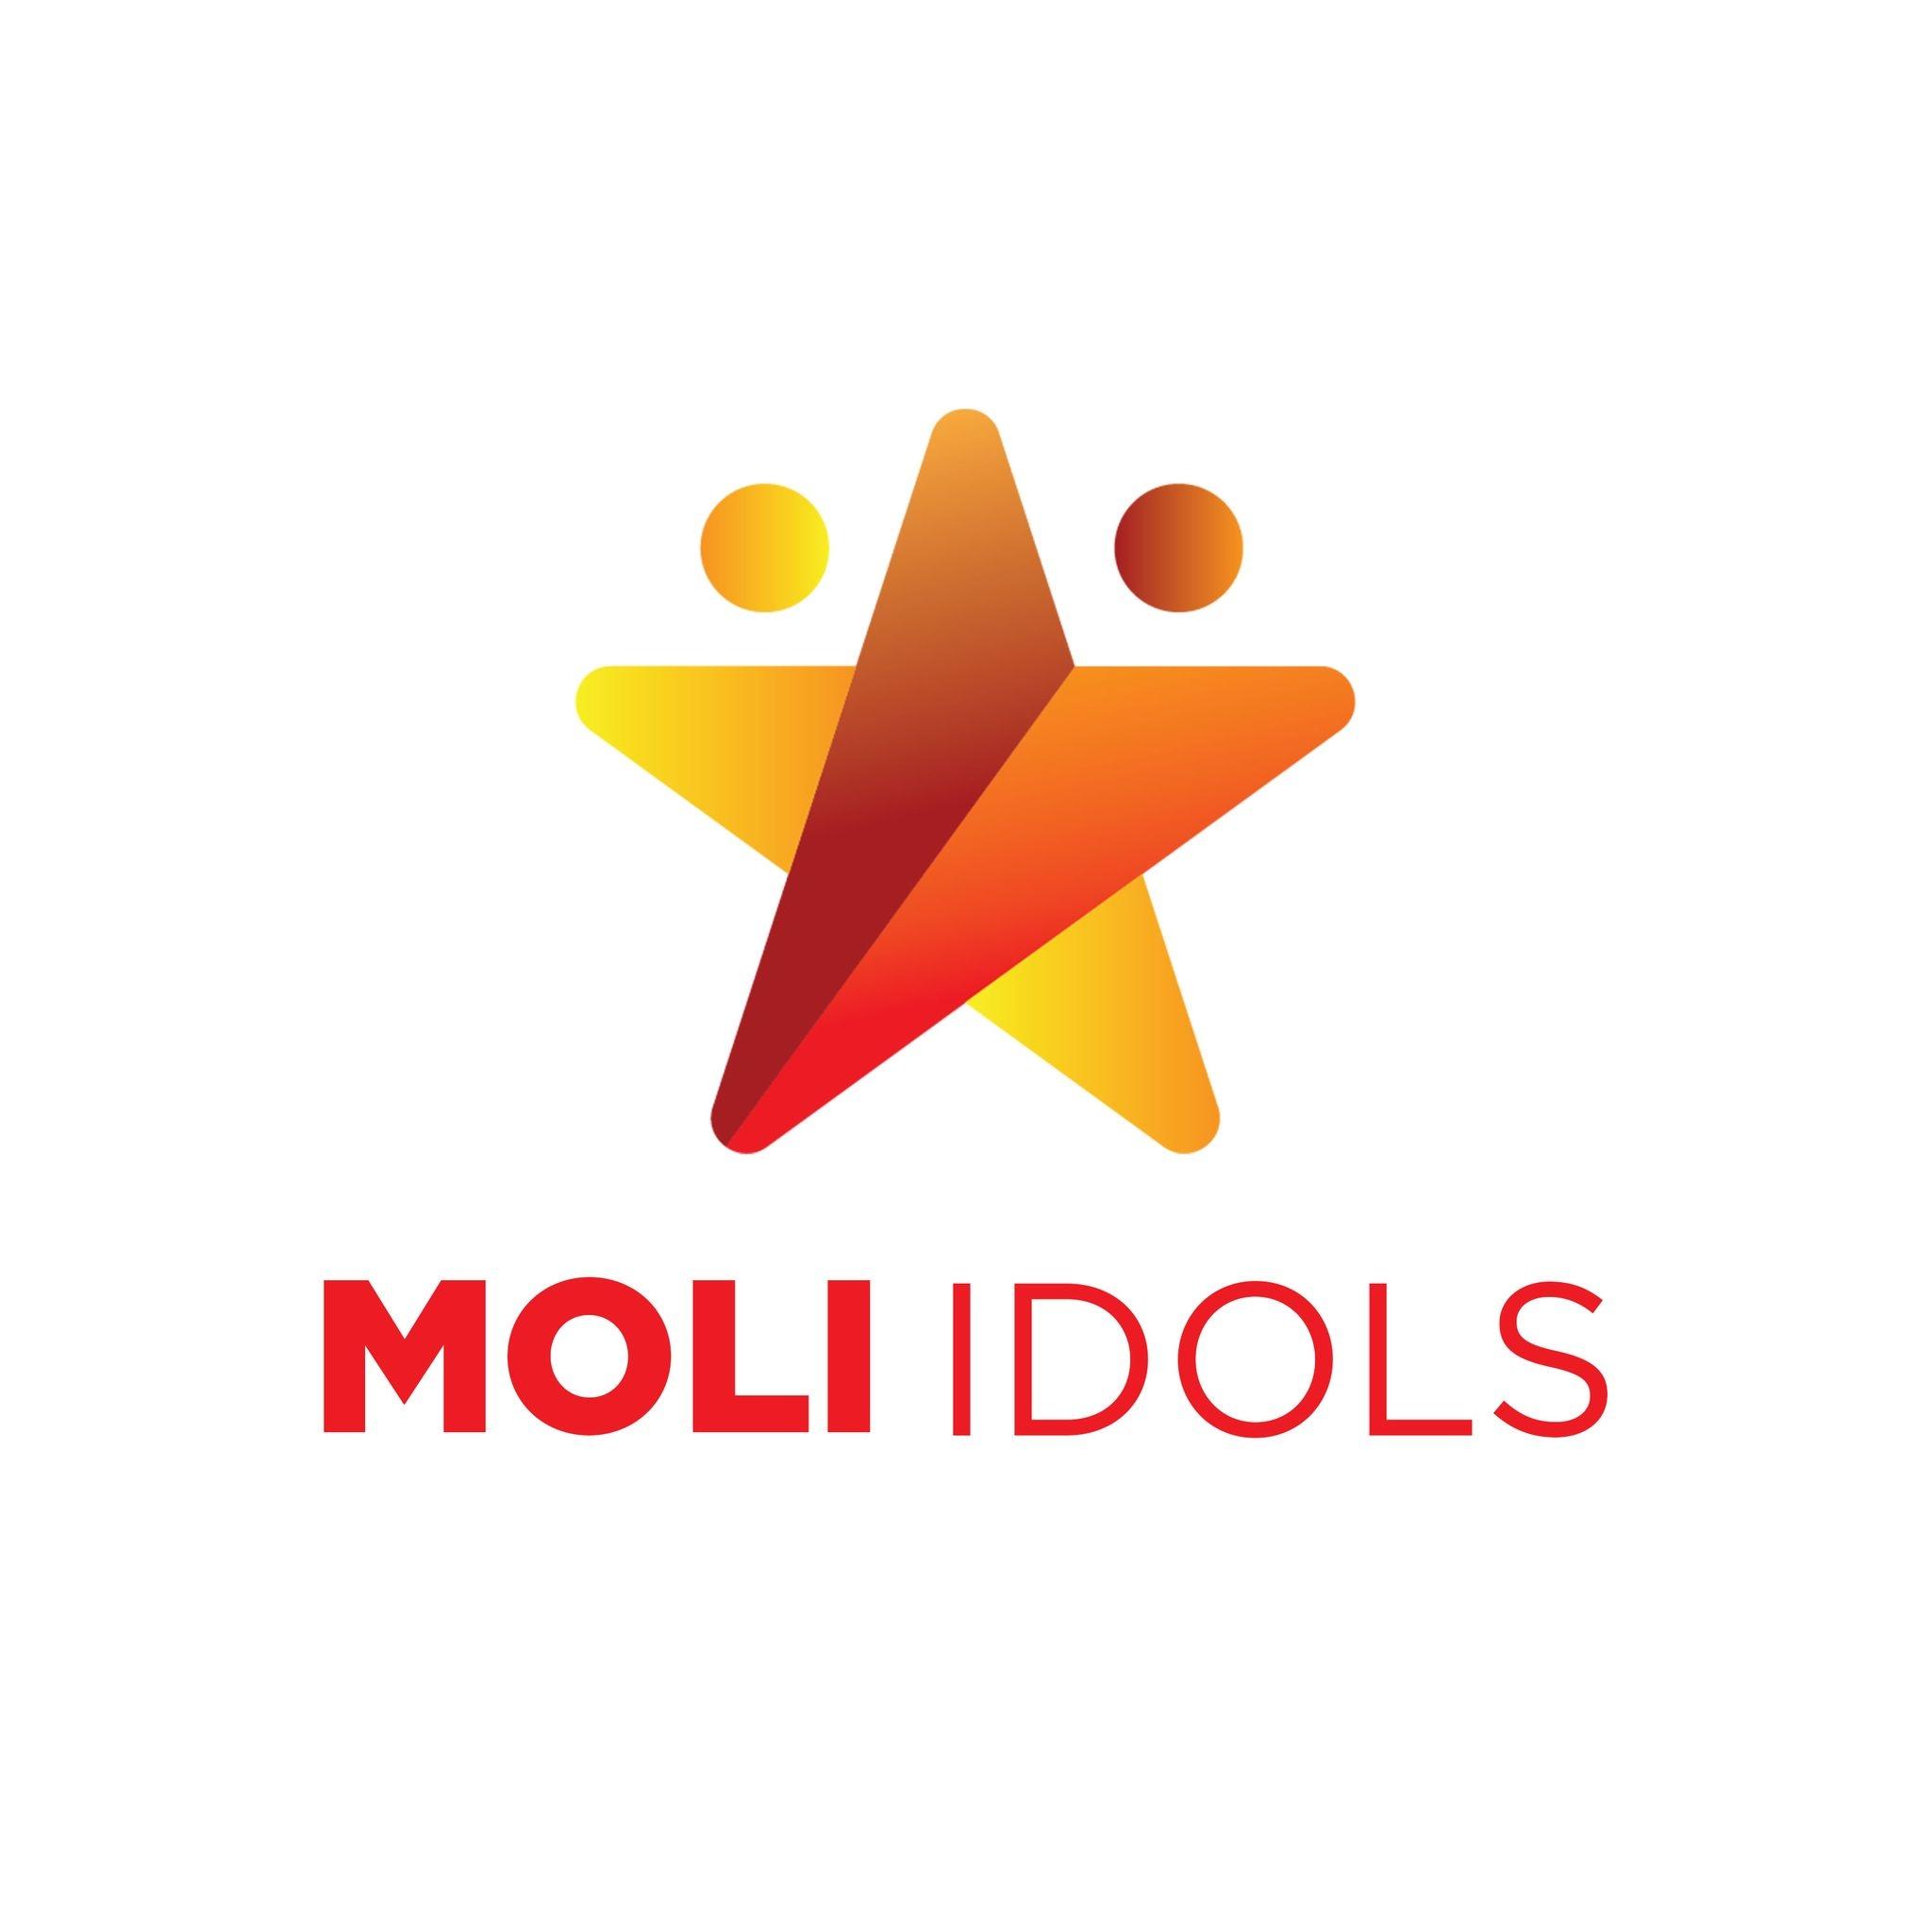 Moli Idols